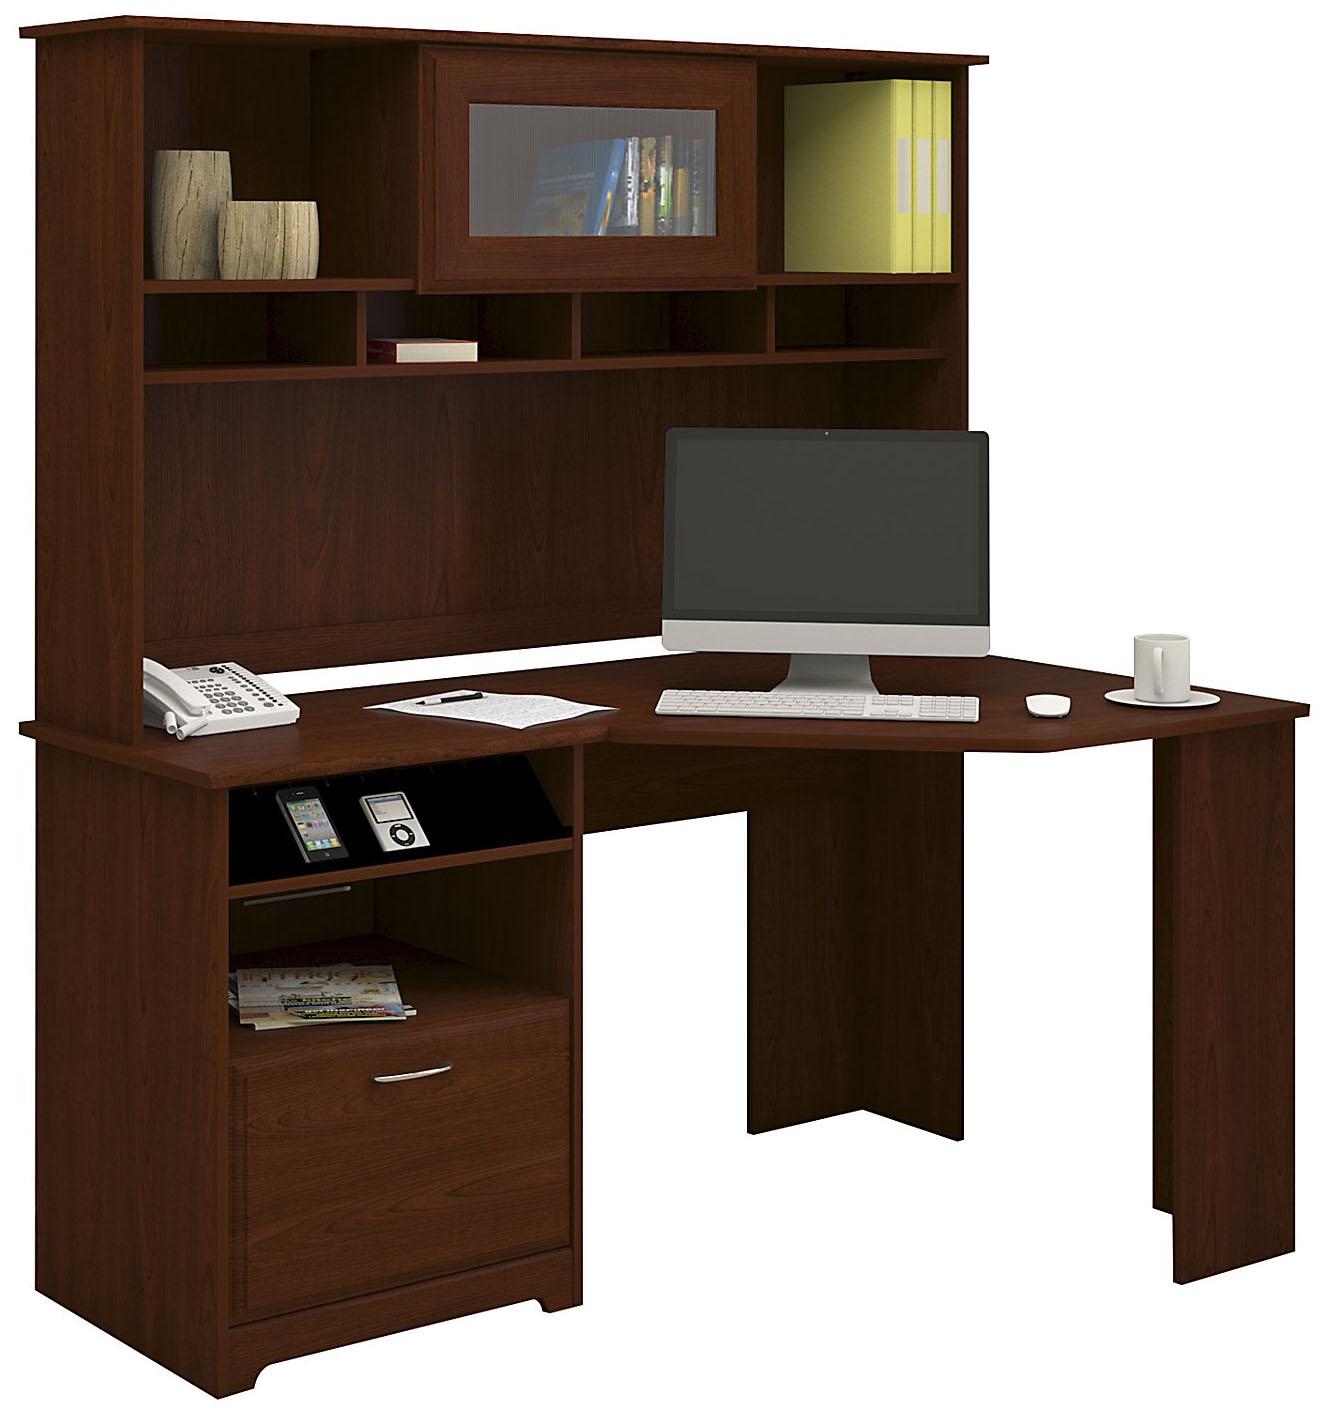 Bush Furniture Cabot Collection Harvest Cherry Corner Desk With Hutch Cab008hvc